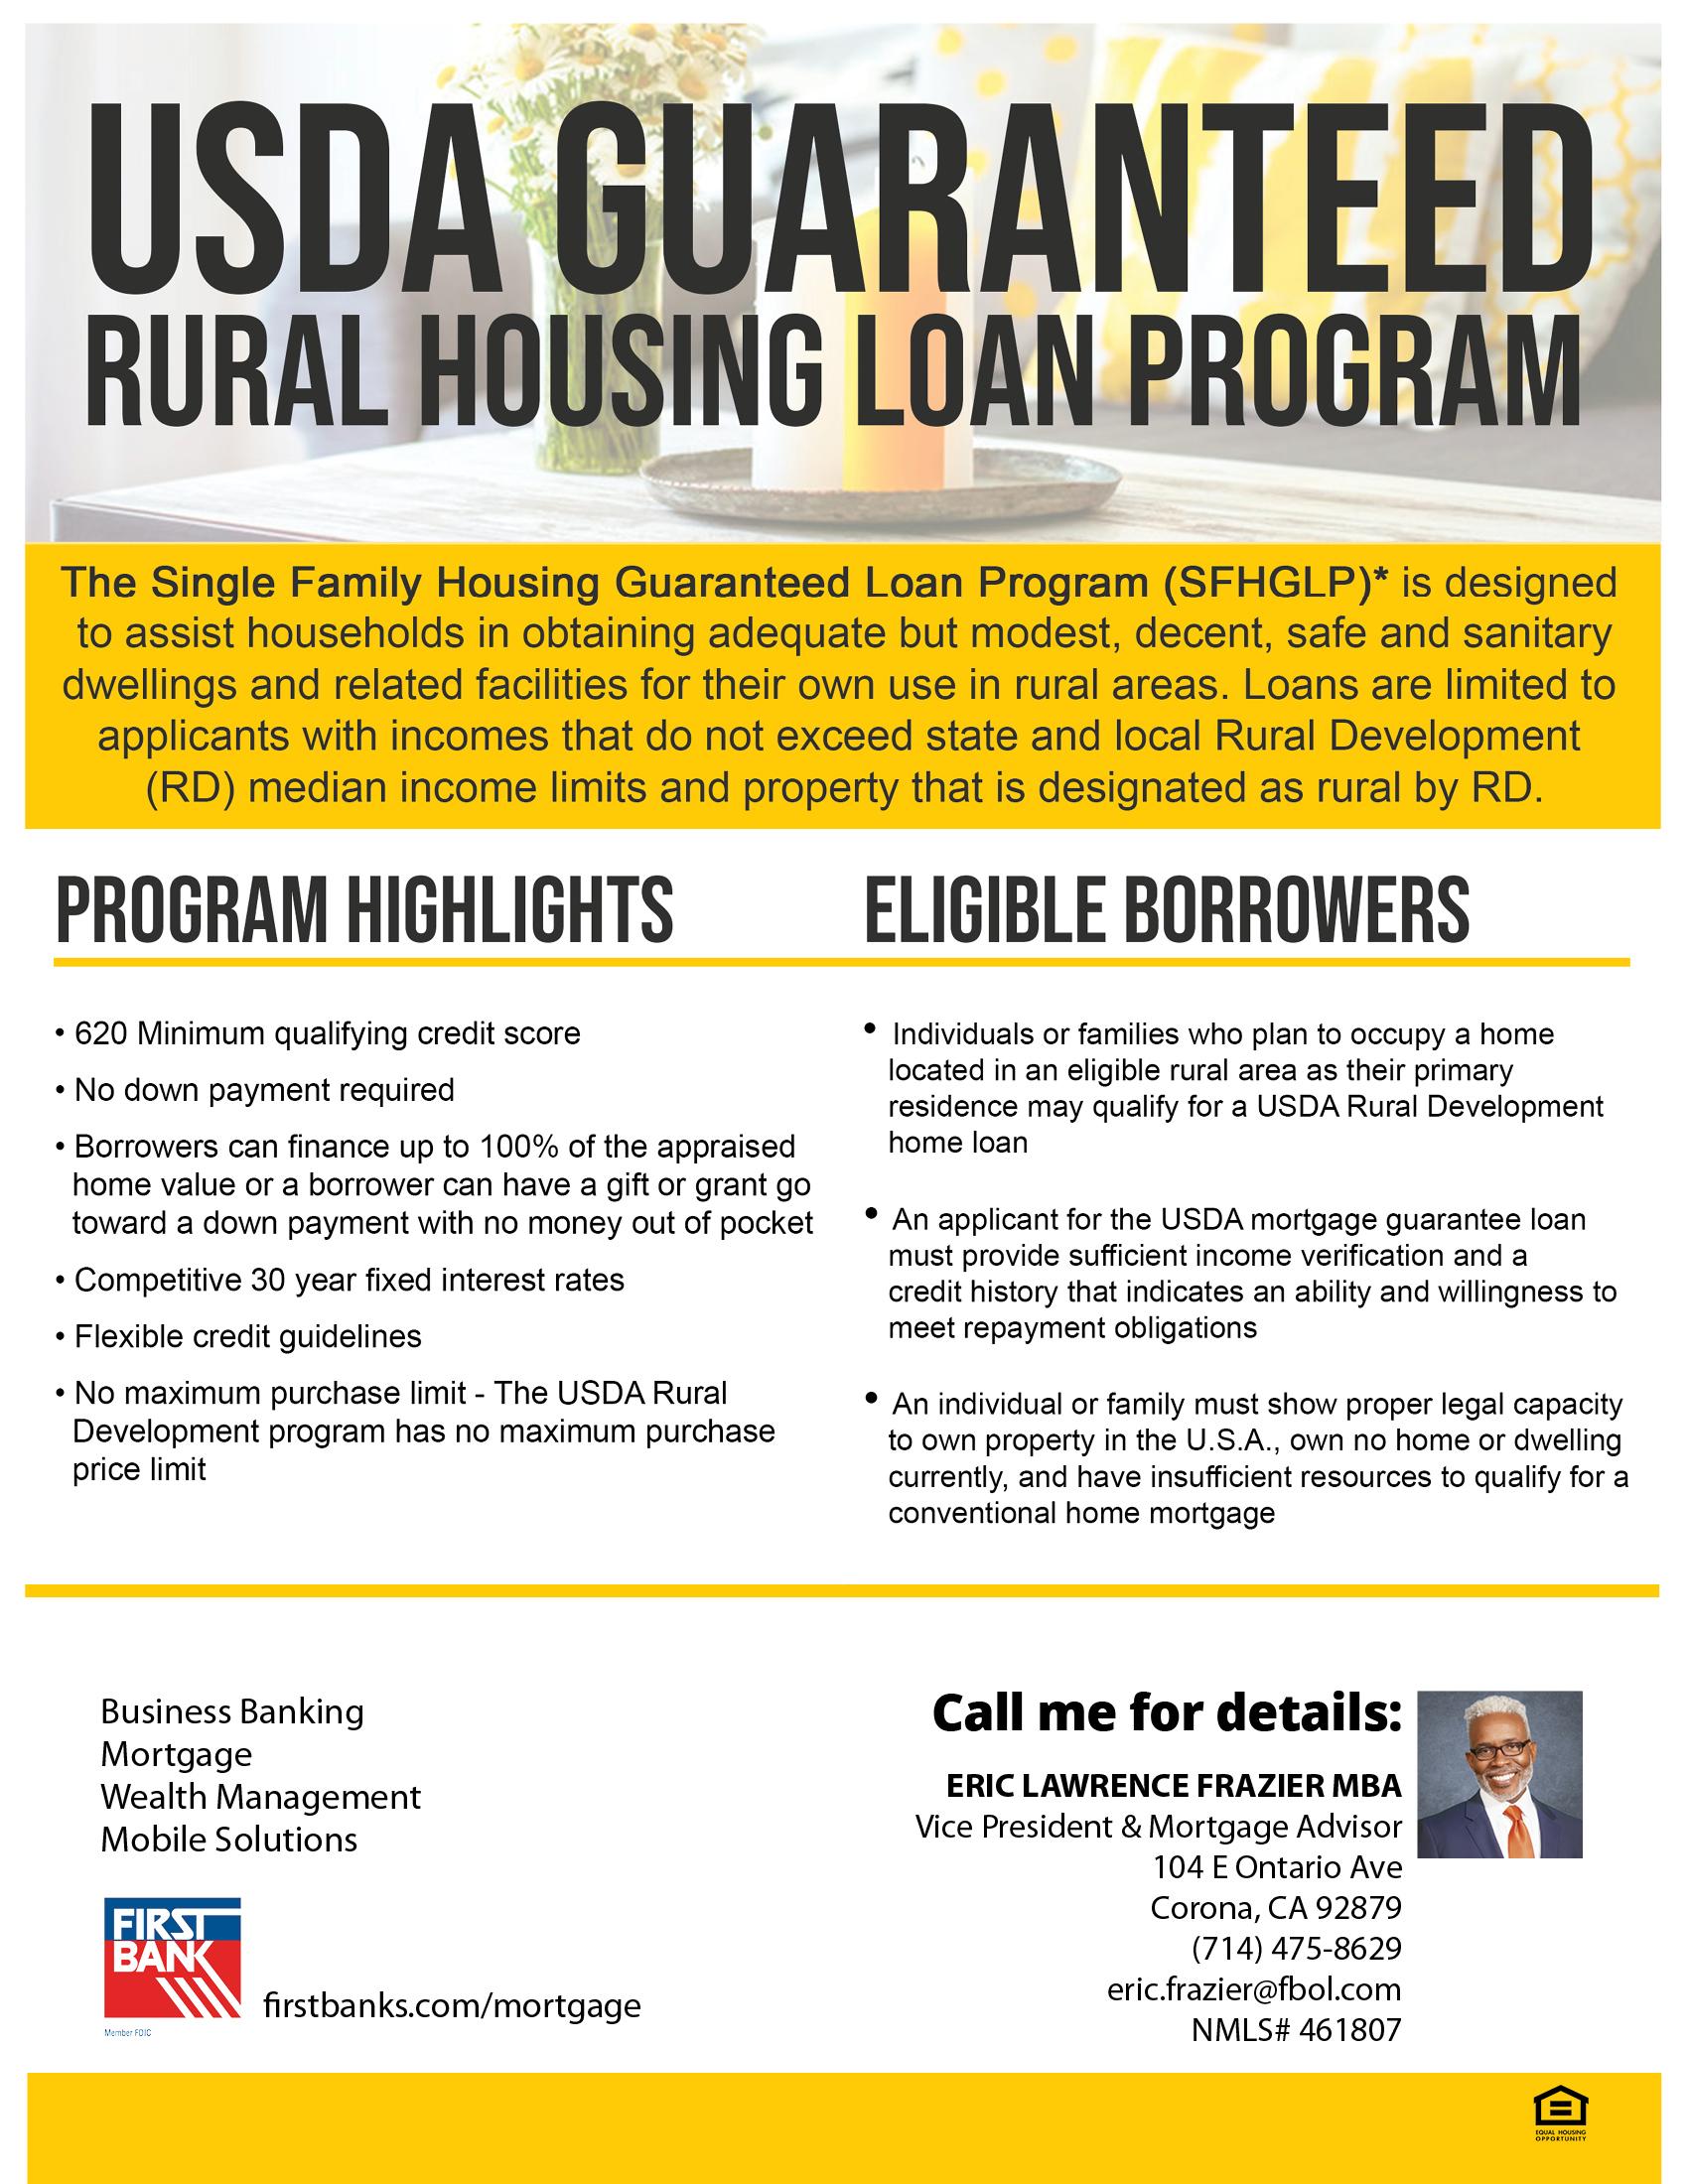 USDA Guaranteed rural housing loan